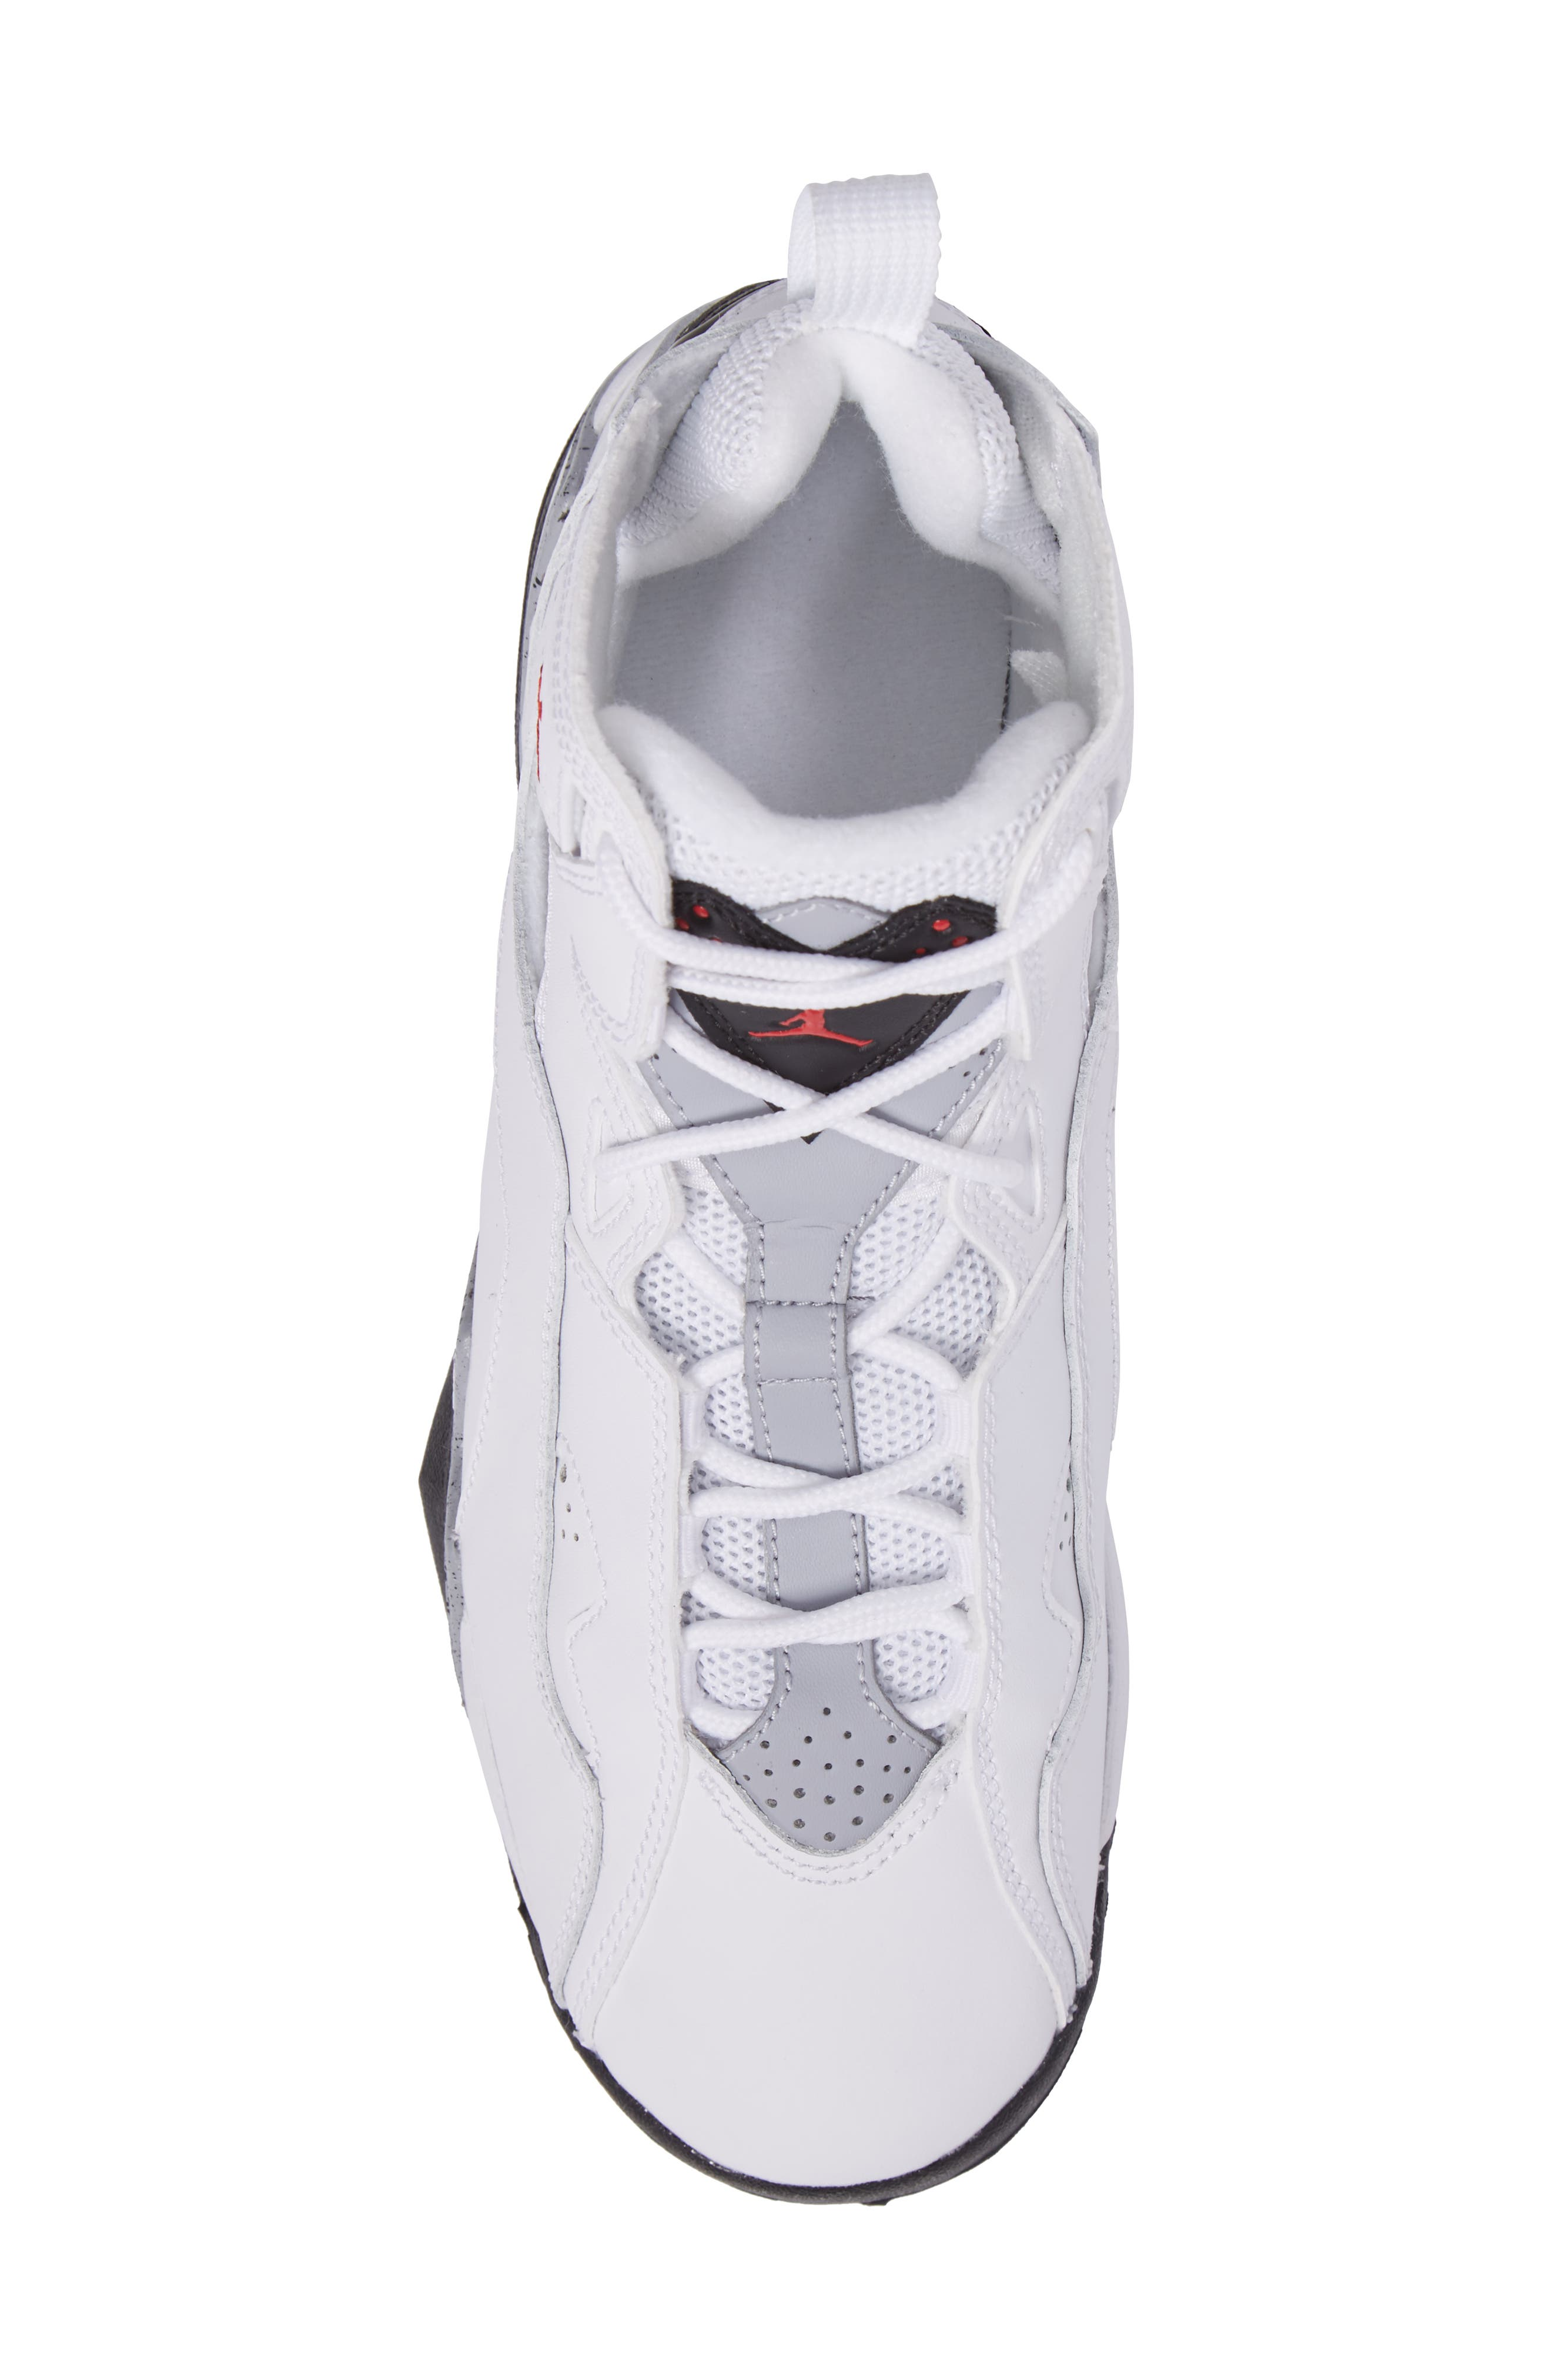 True Flight BG High Top Sneaker,                             Alternate thumbnail 5, color,                             White/ Gym Red/ Wolf Grey